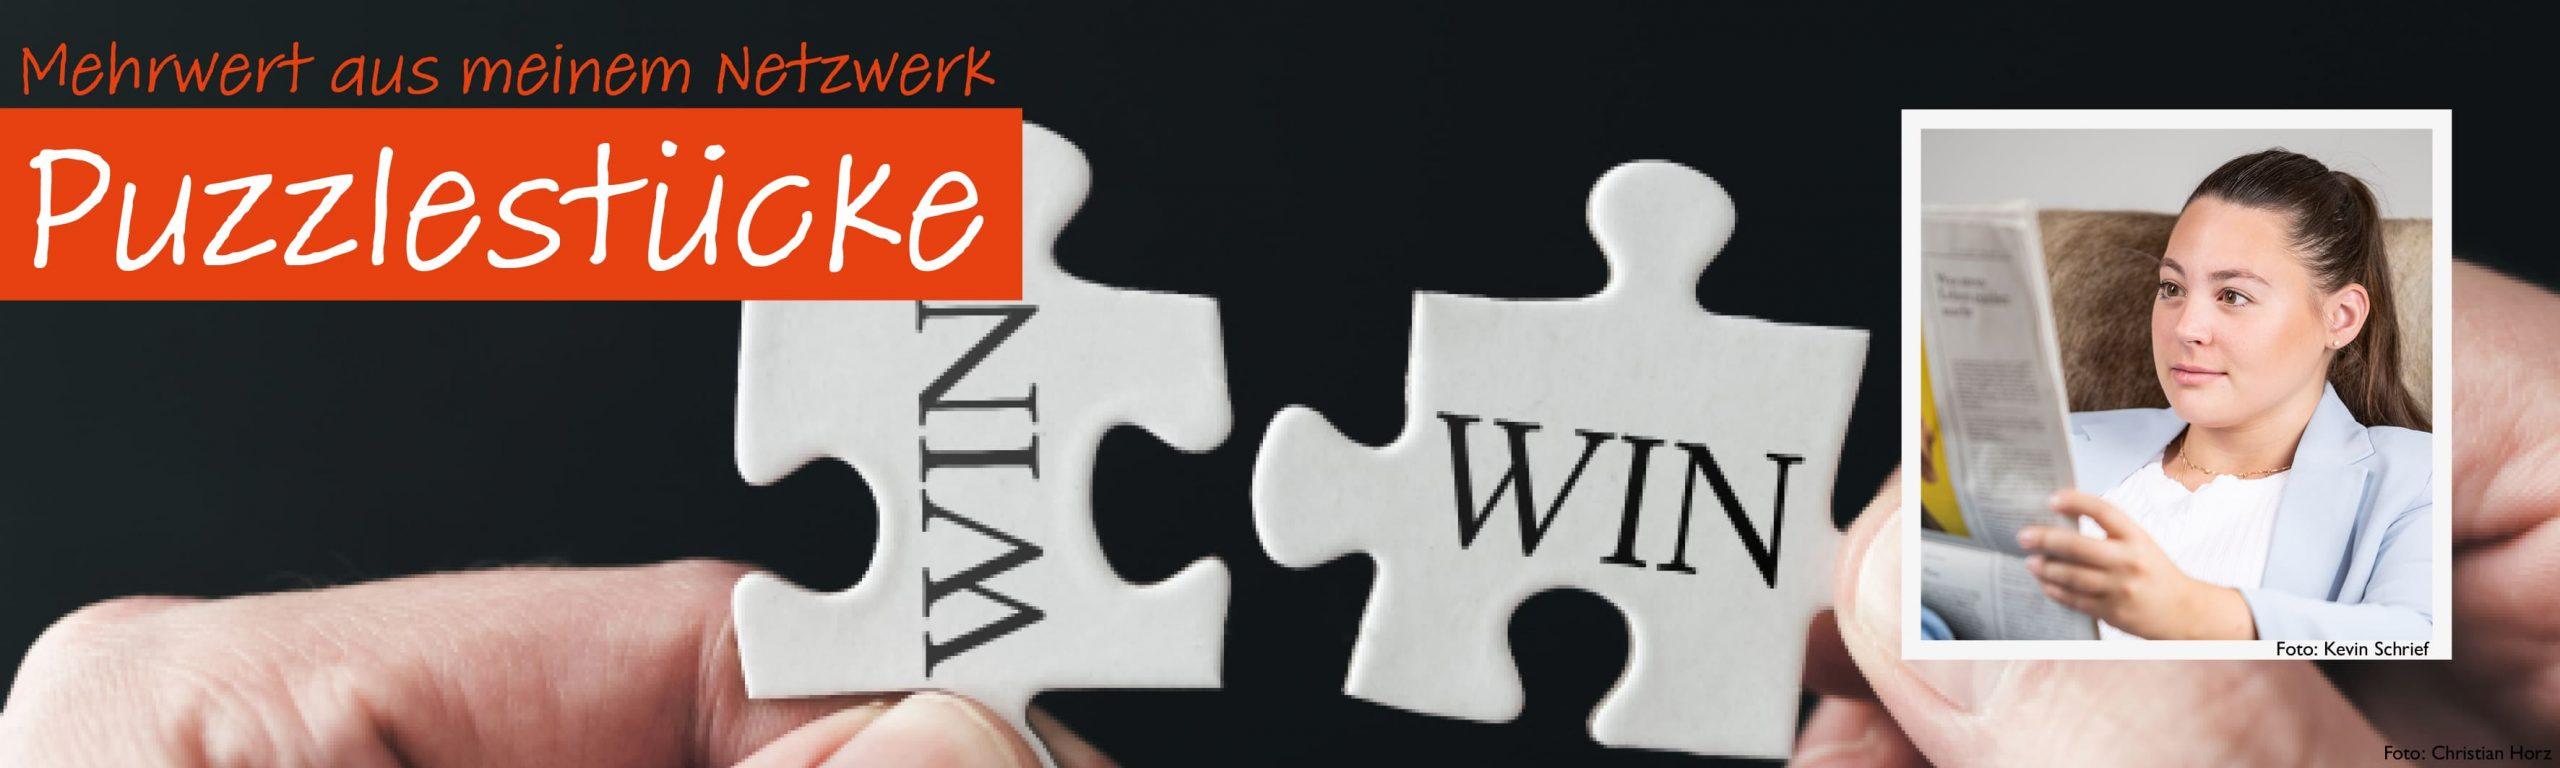 Puzzlestück: Lena Wingen